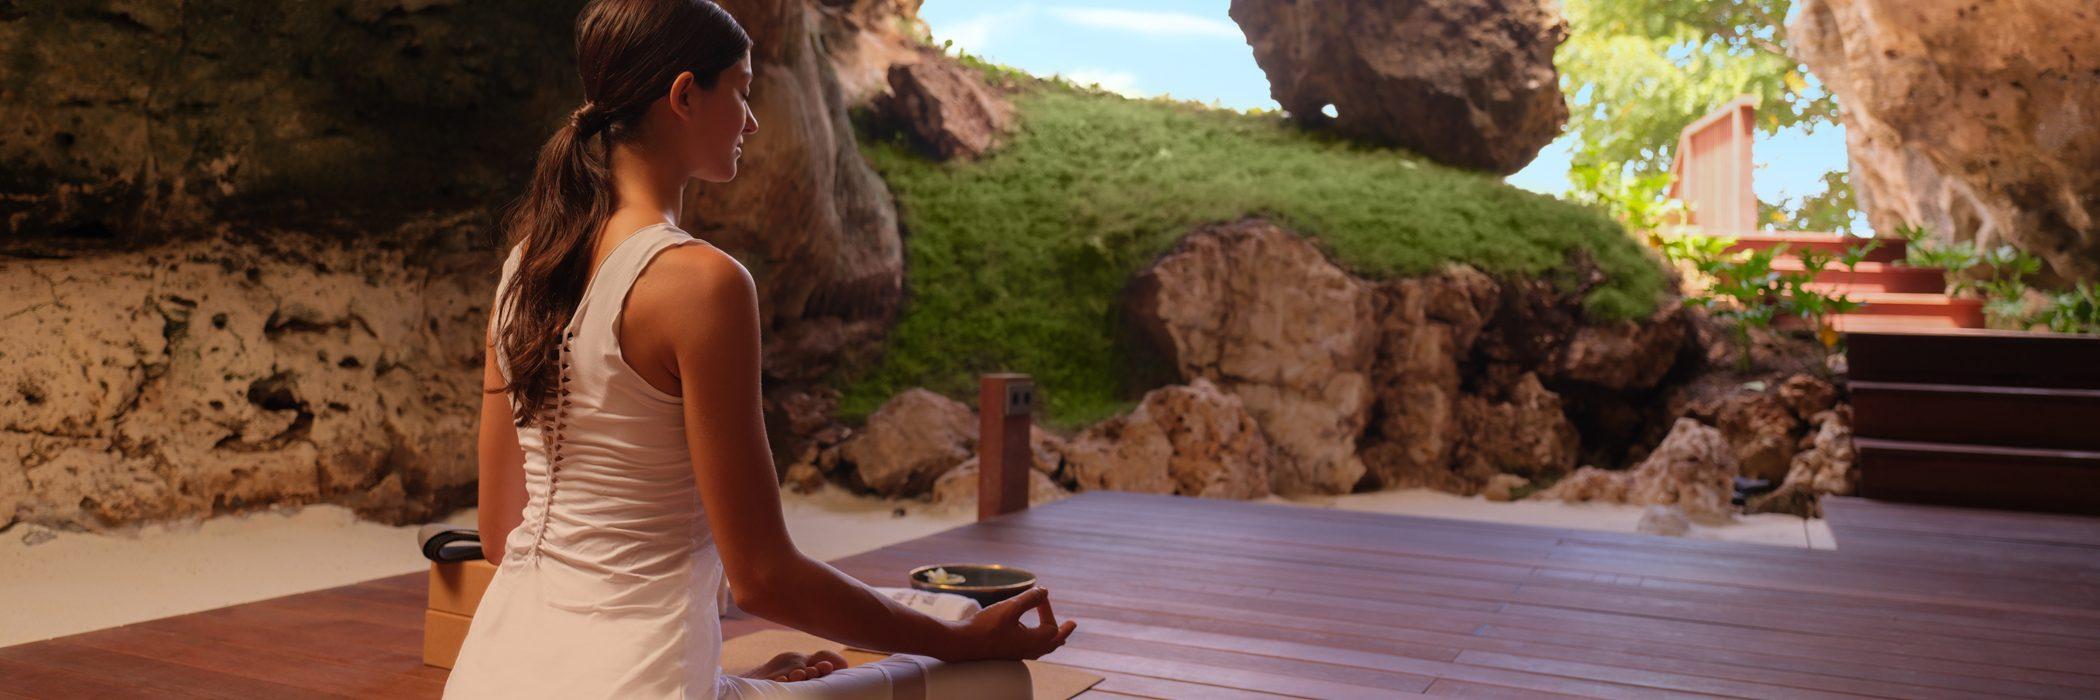 Raffles Bali - Morning Meditation at The Secret Cave